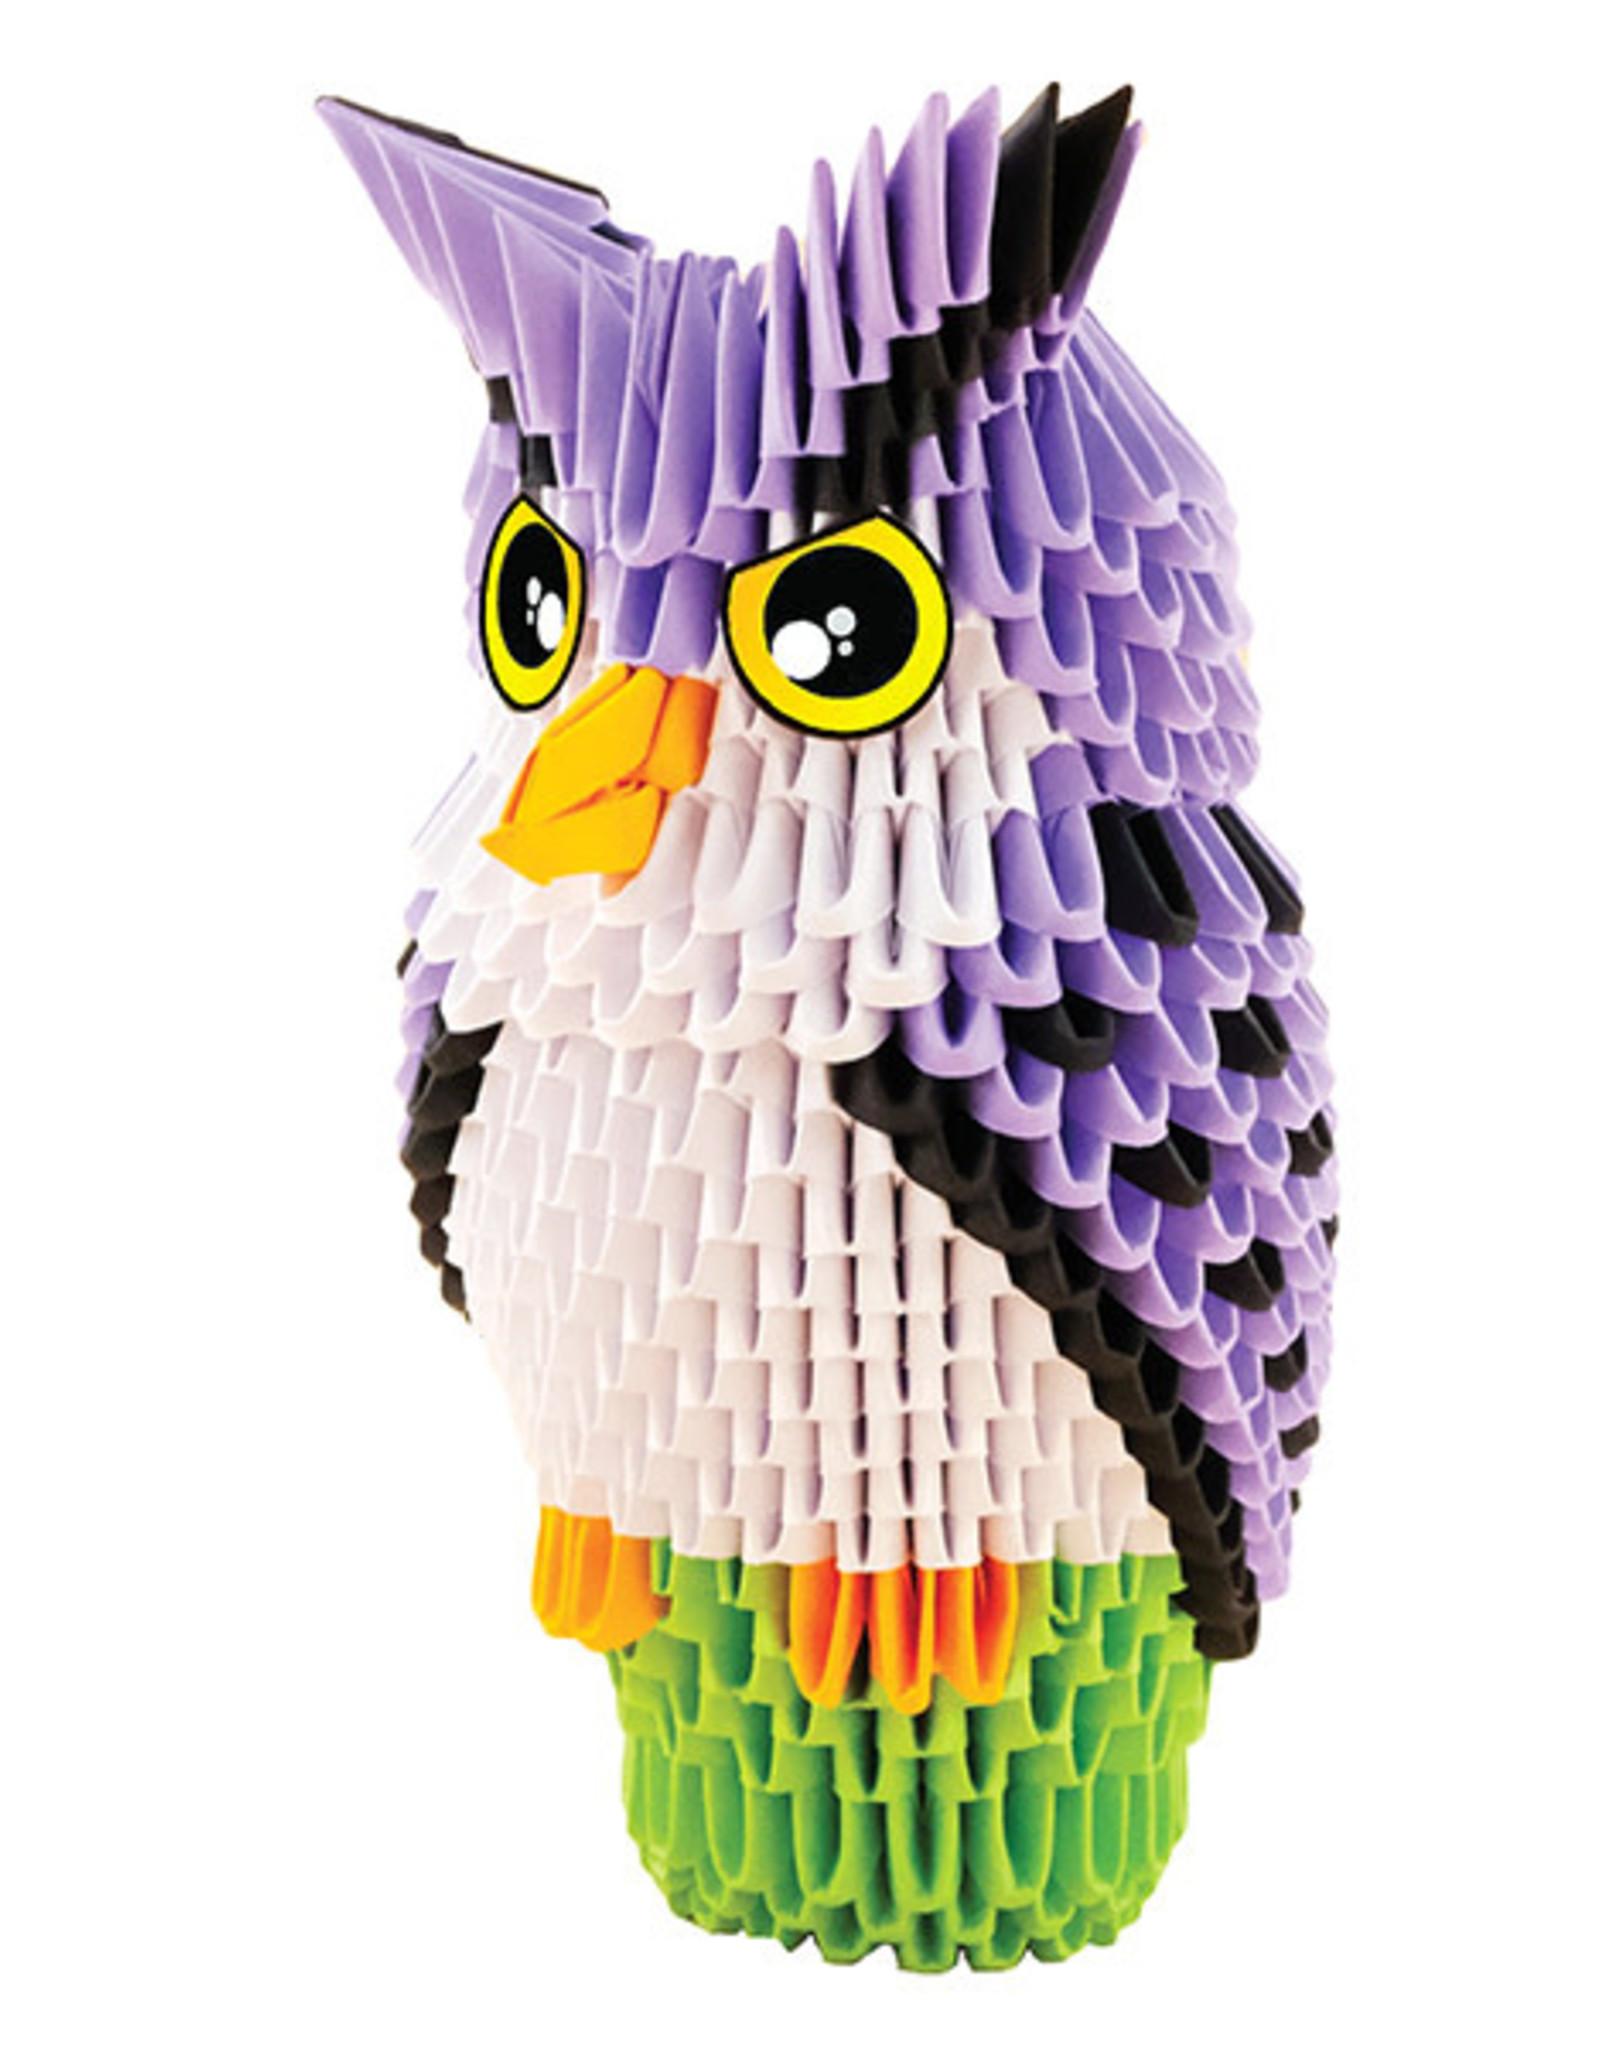 Creagami Creagami-Owl 657pc